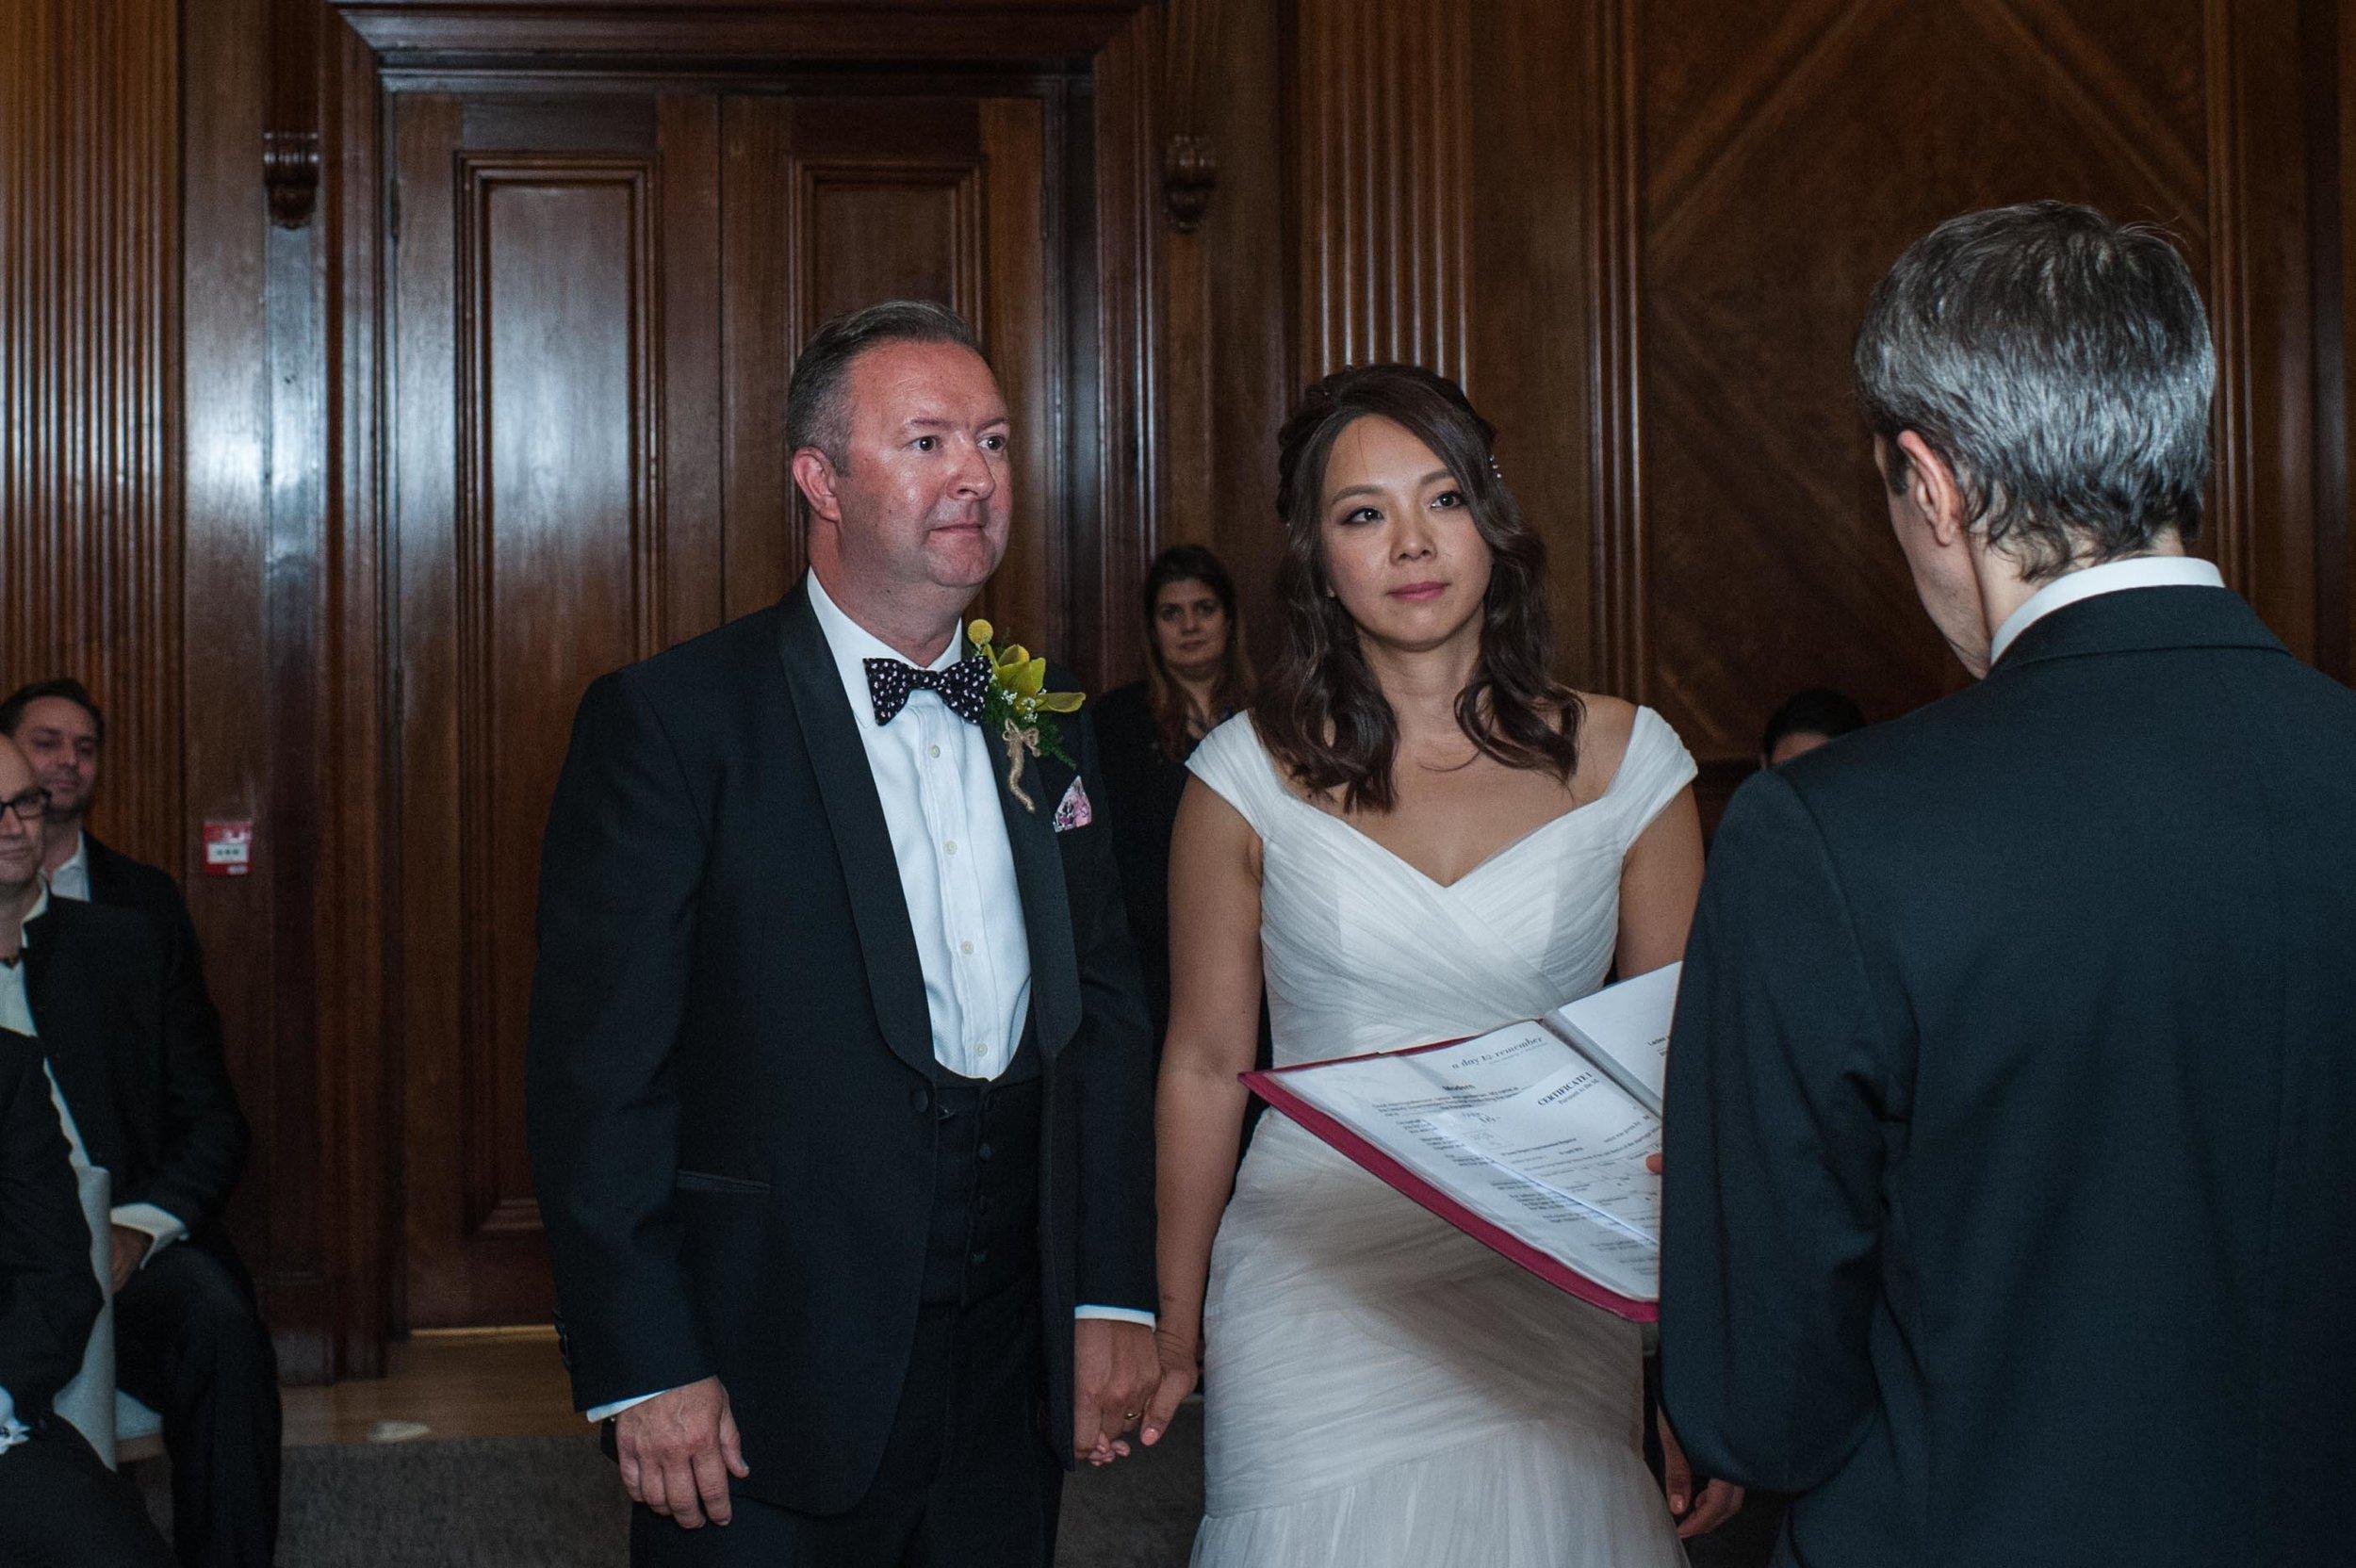 D&M_Marylebone Town Hall Wedding (96 of 239).jpg